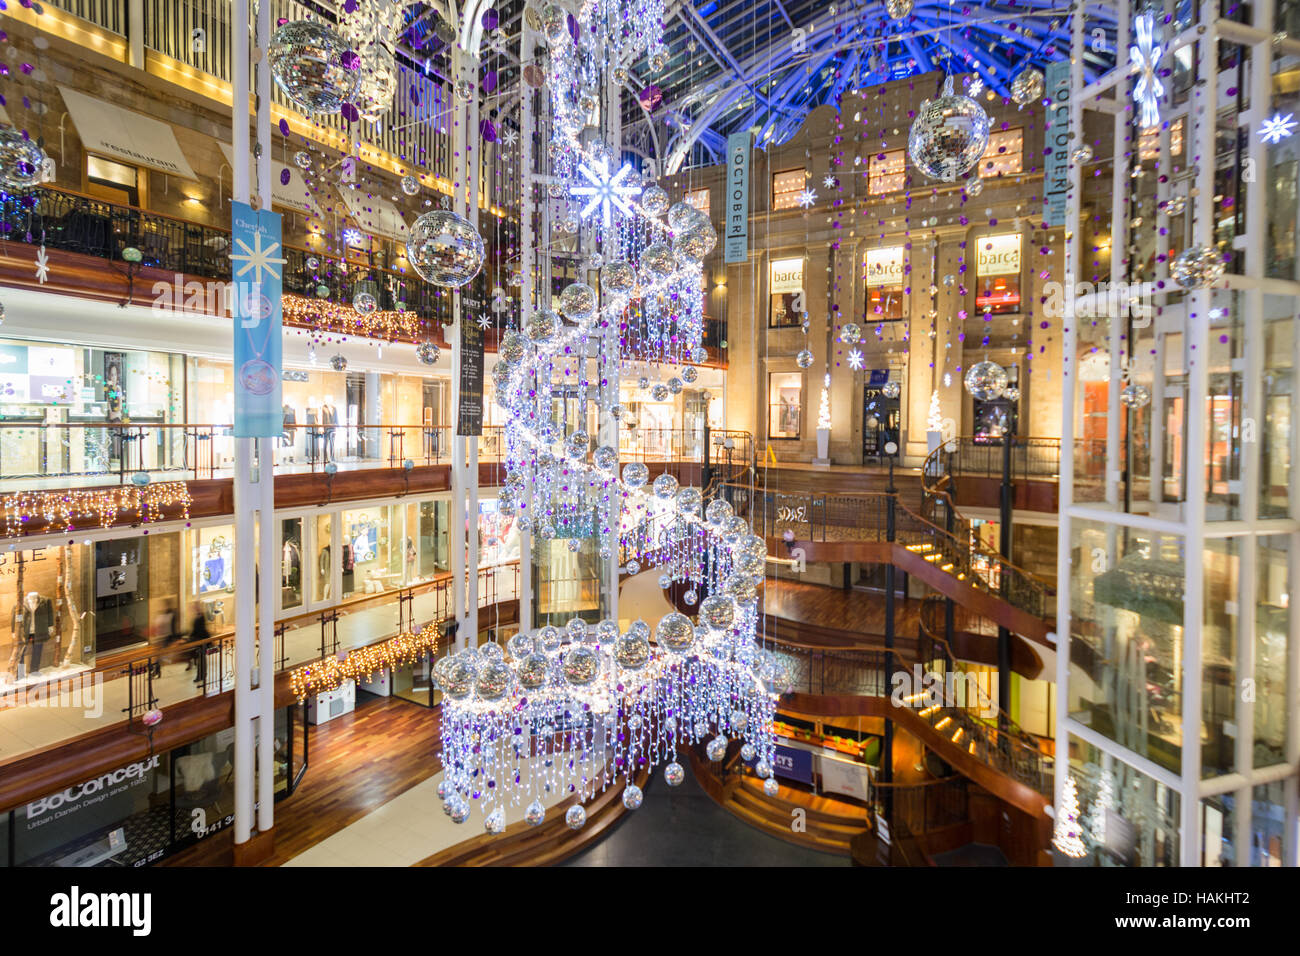 Princes Square Glasgow christmas decorations 2016 Stock Photo